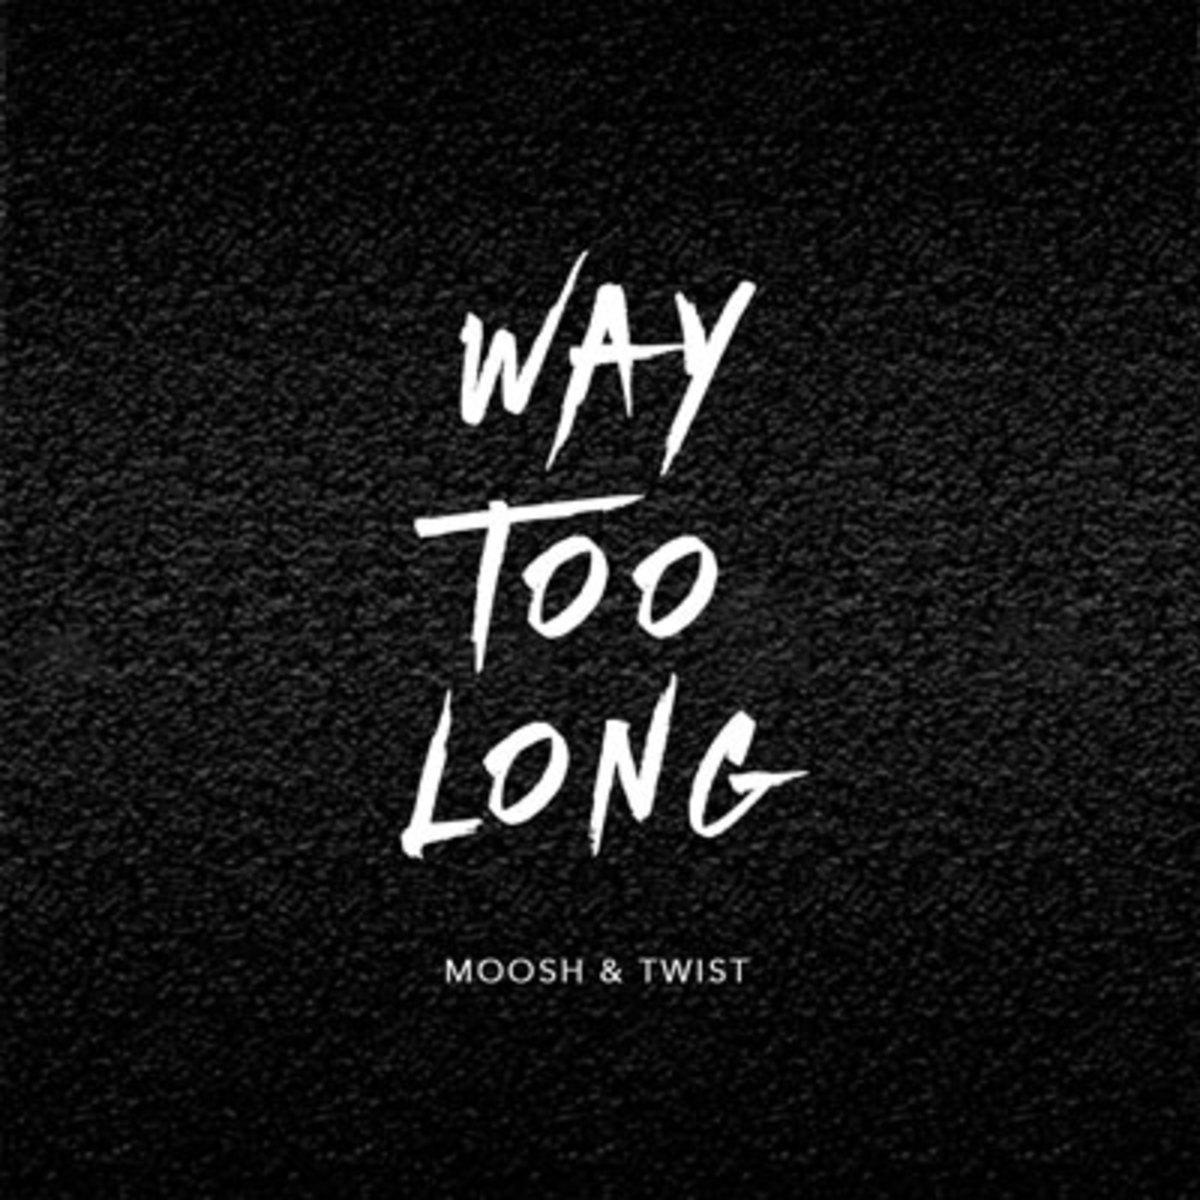 moosh-twist-way-too-long.jpg